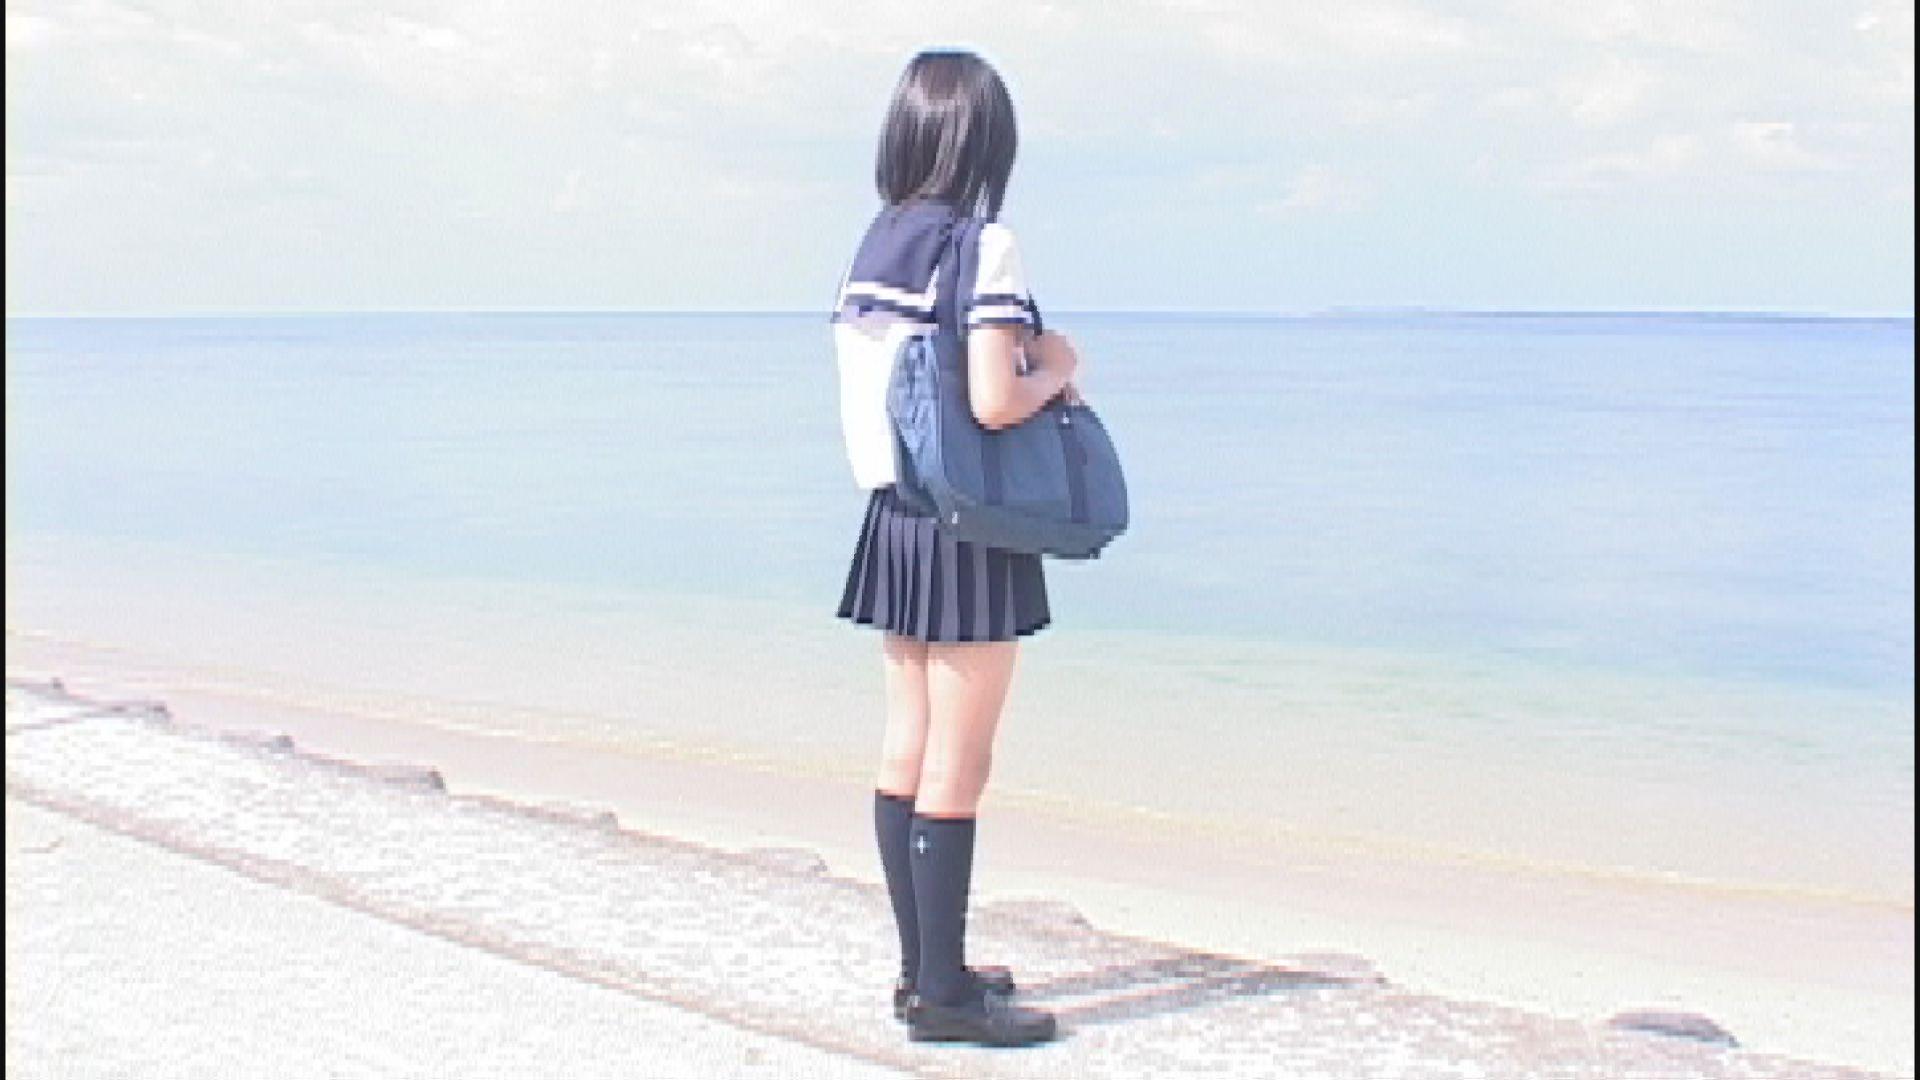 mayumi vol.1 / まゆみ 10